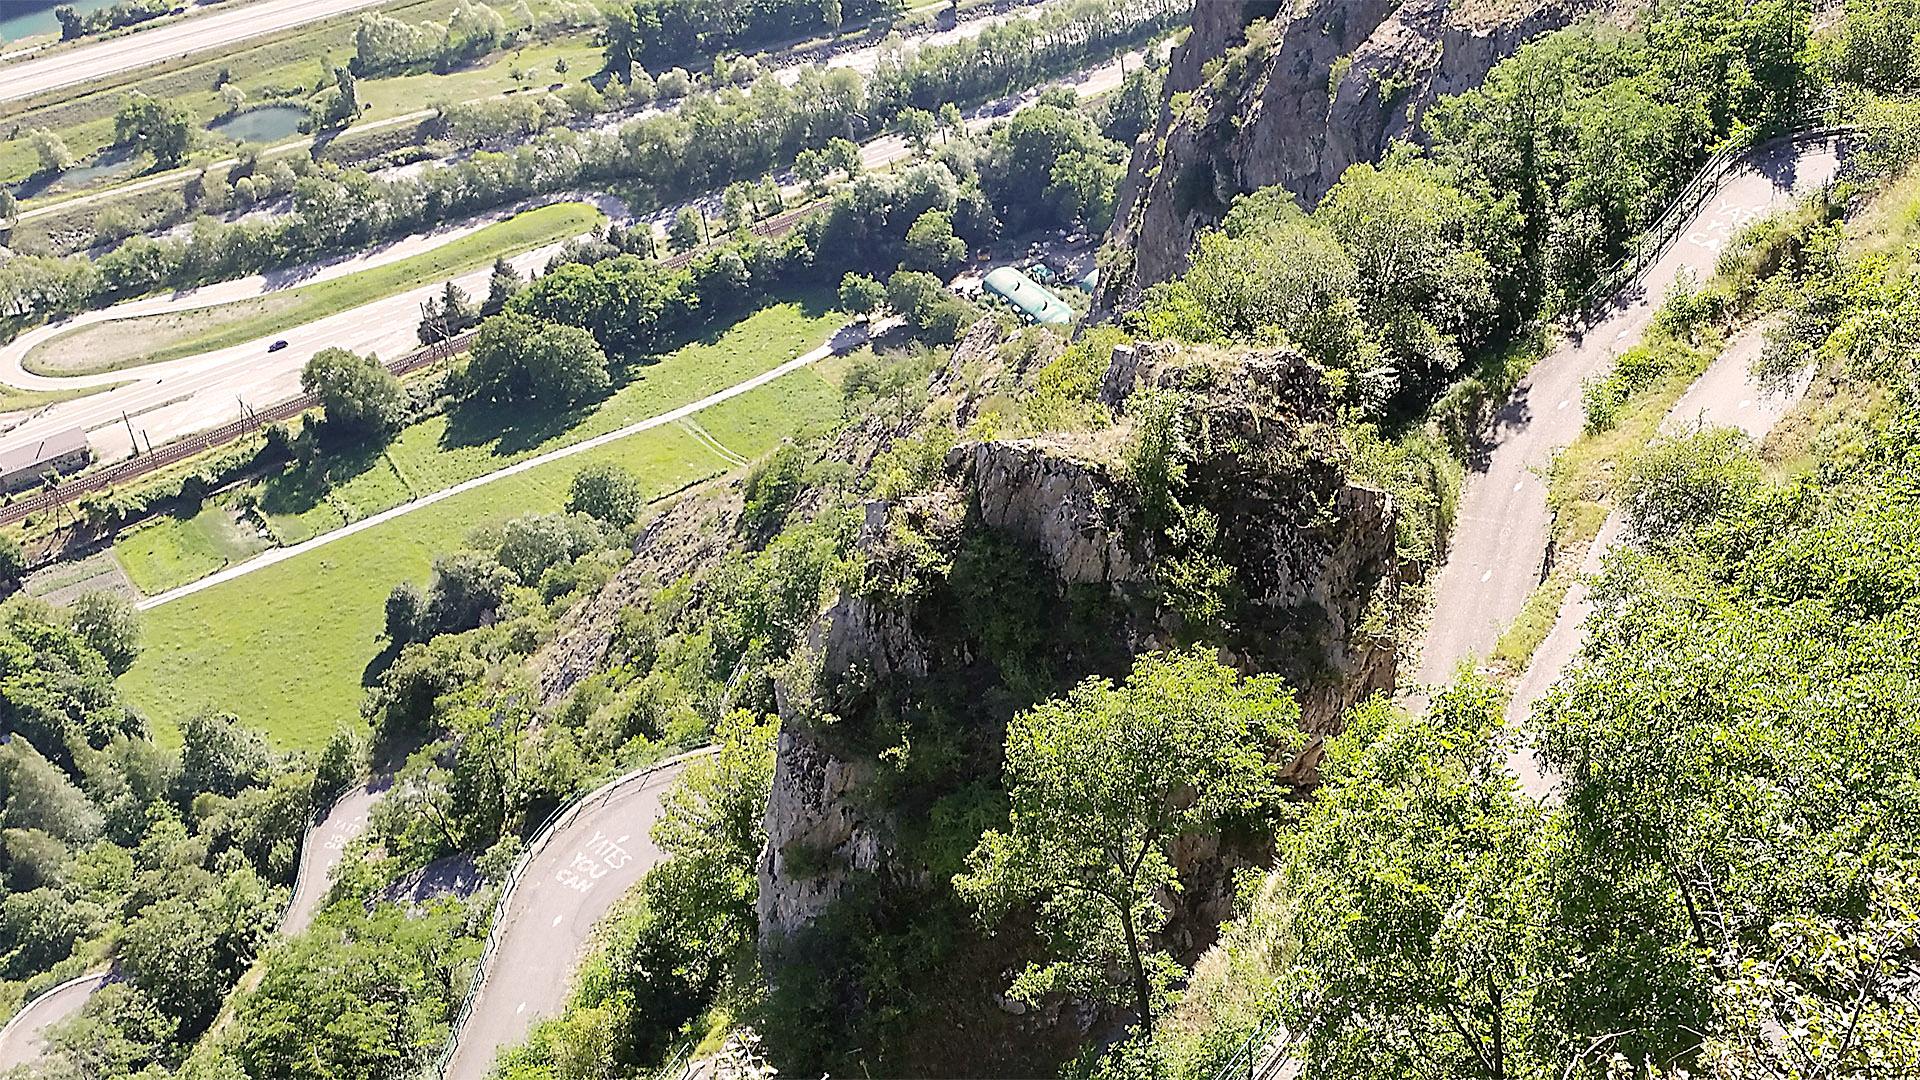 1533 - F - Col du Chaussy © Pässe.Info